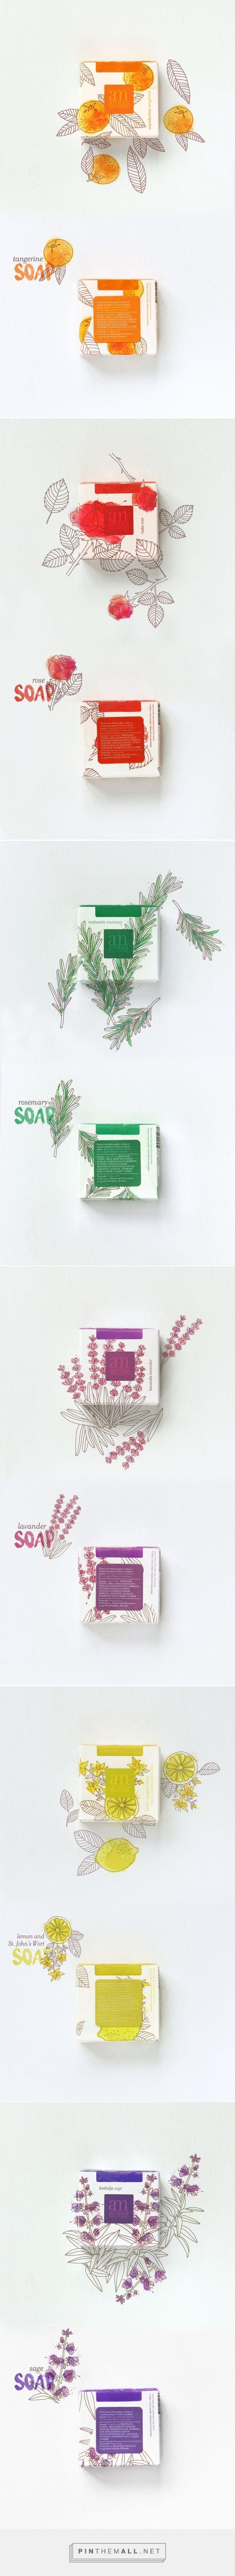 Aroma Mediterranea soaps — The Dieline - Branding & Packaging